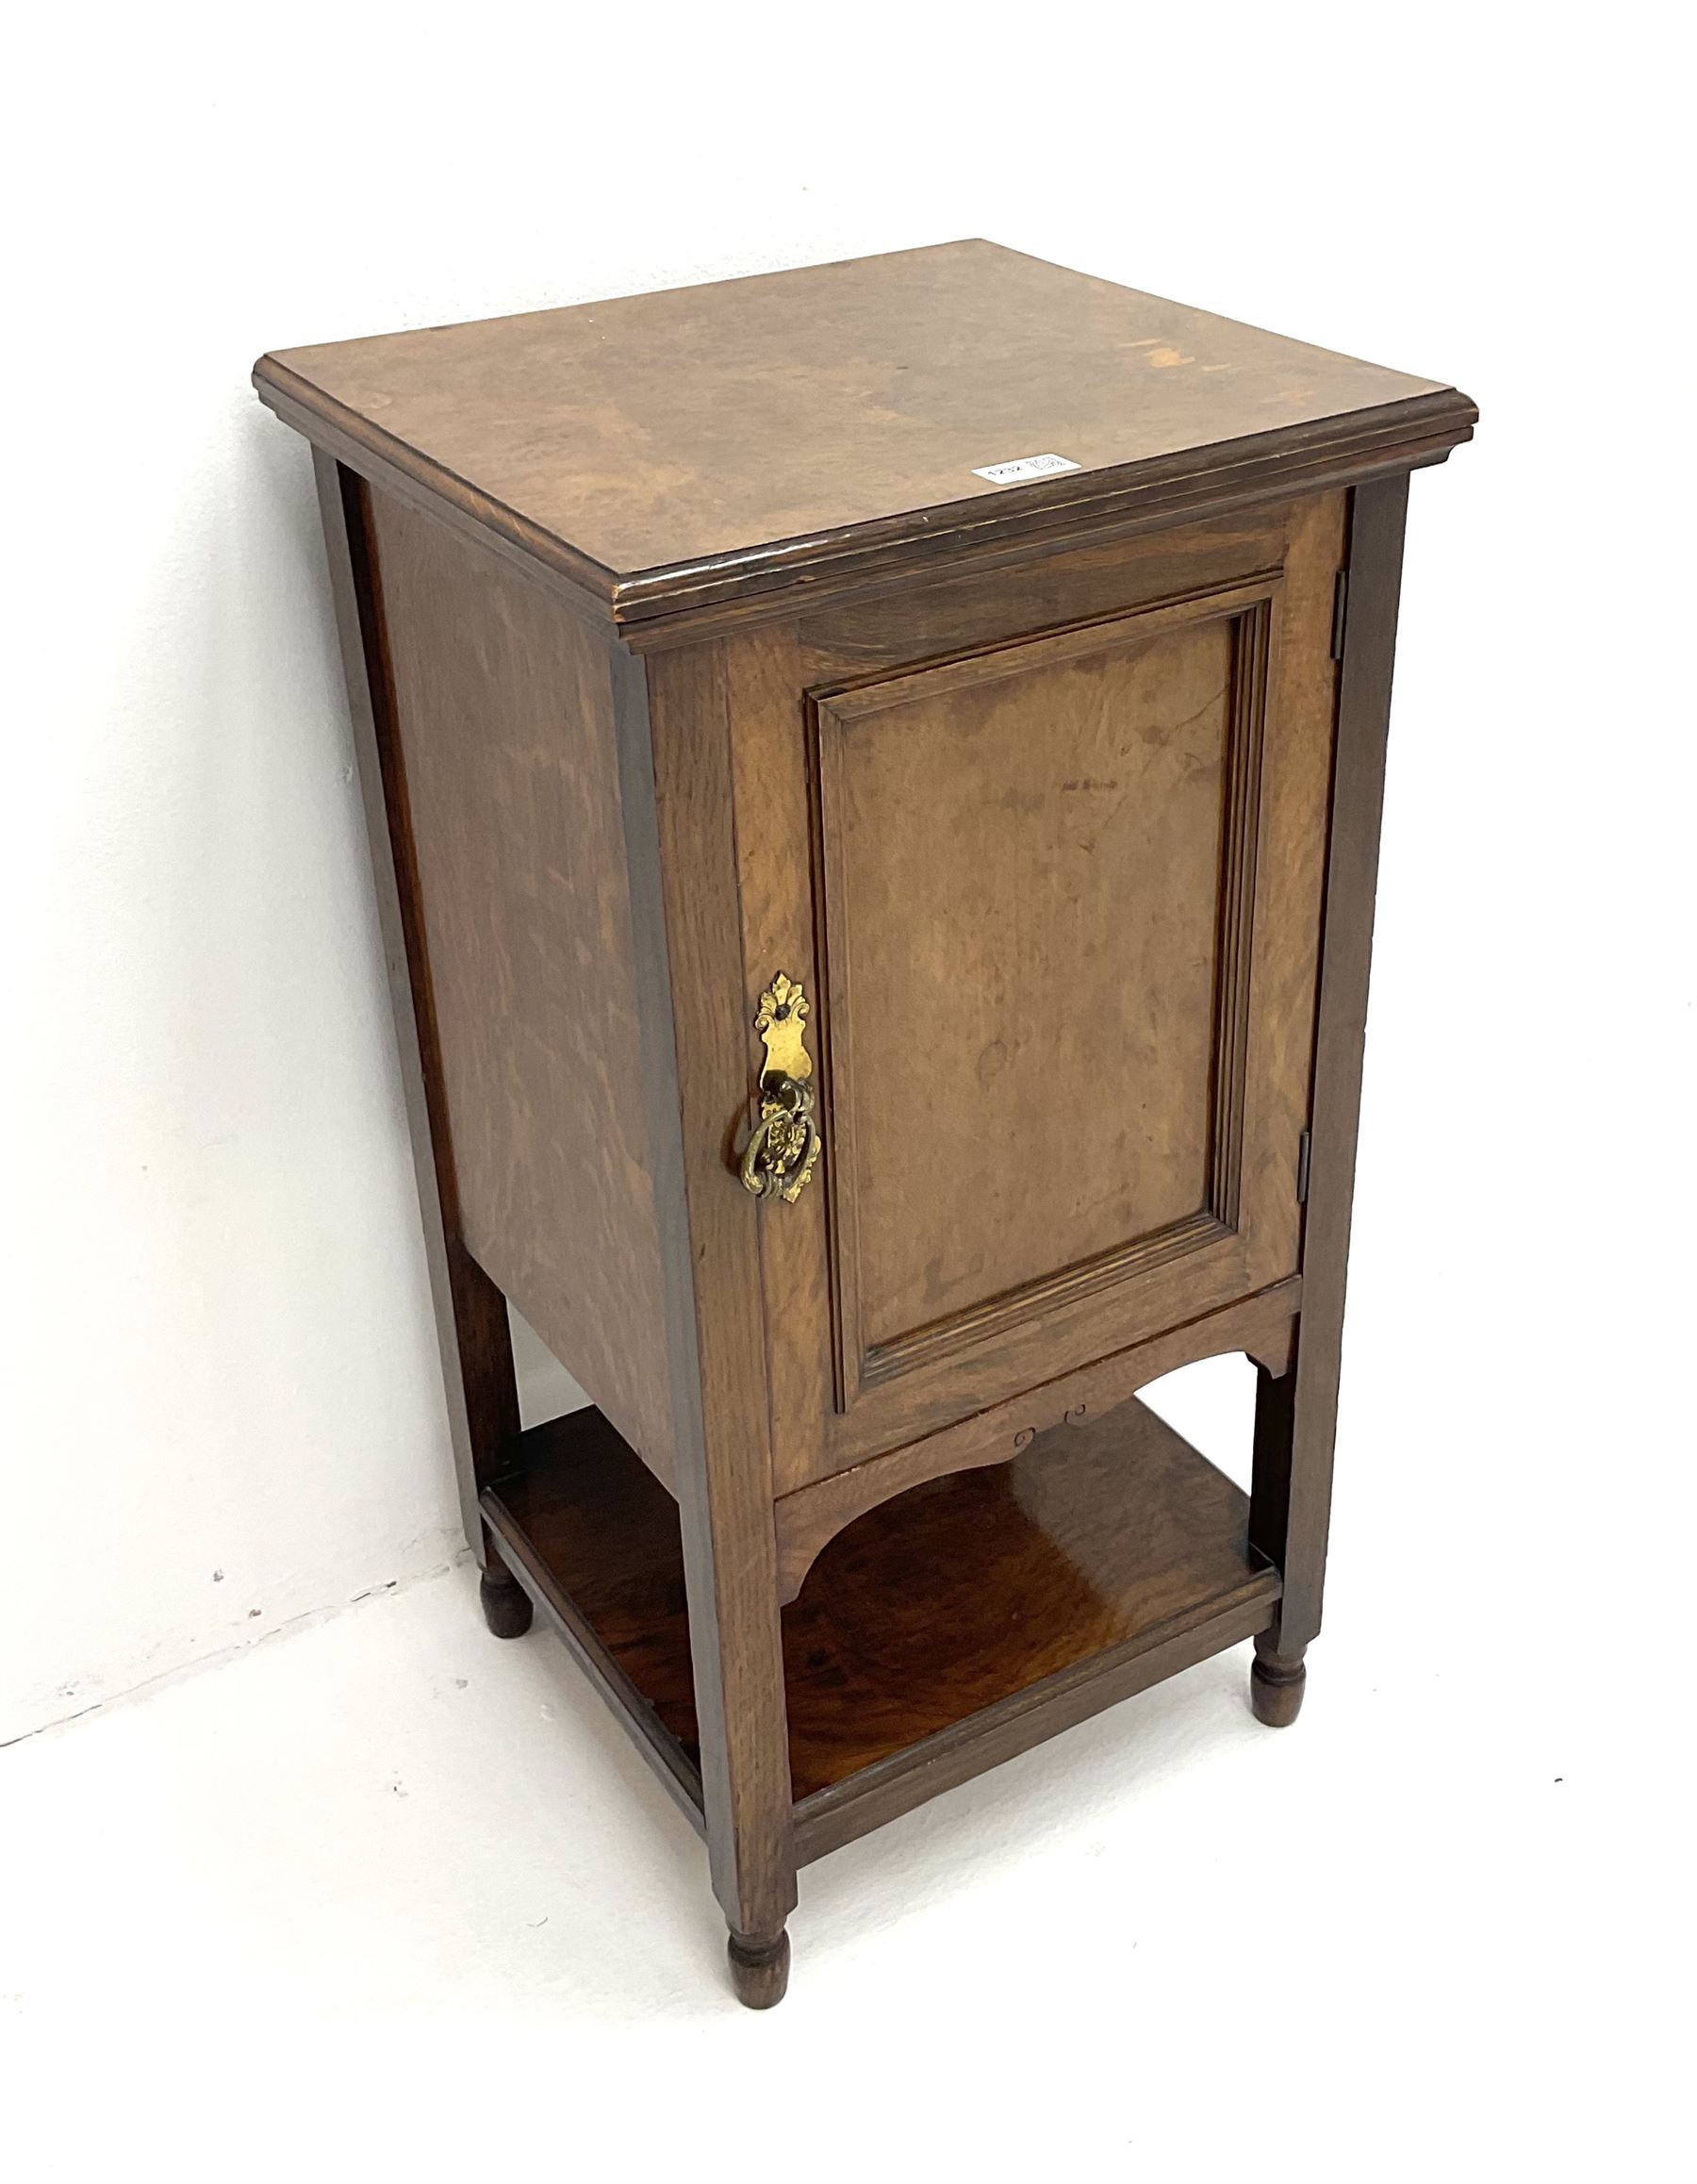 Edwardian oak bedside pot cupboard enclosed by panelled door - Image 2 of 3